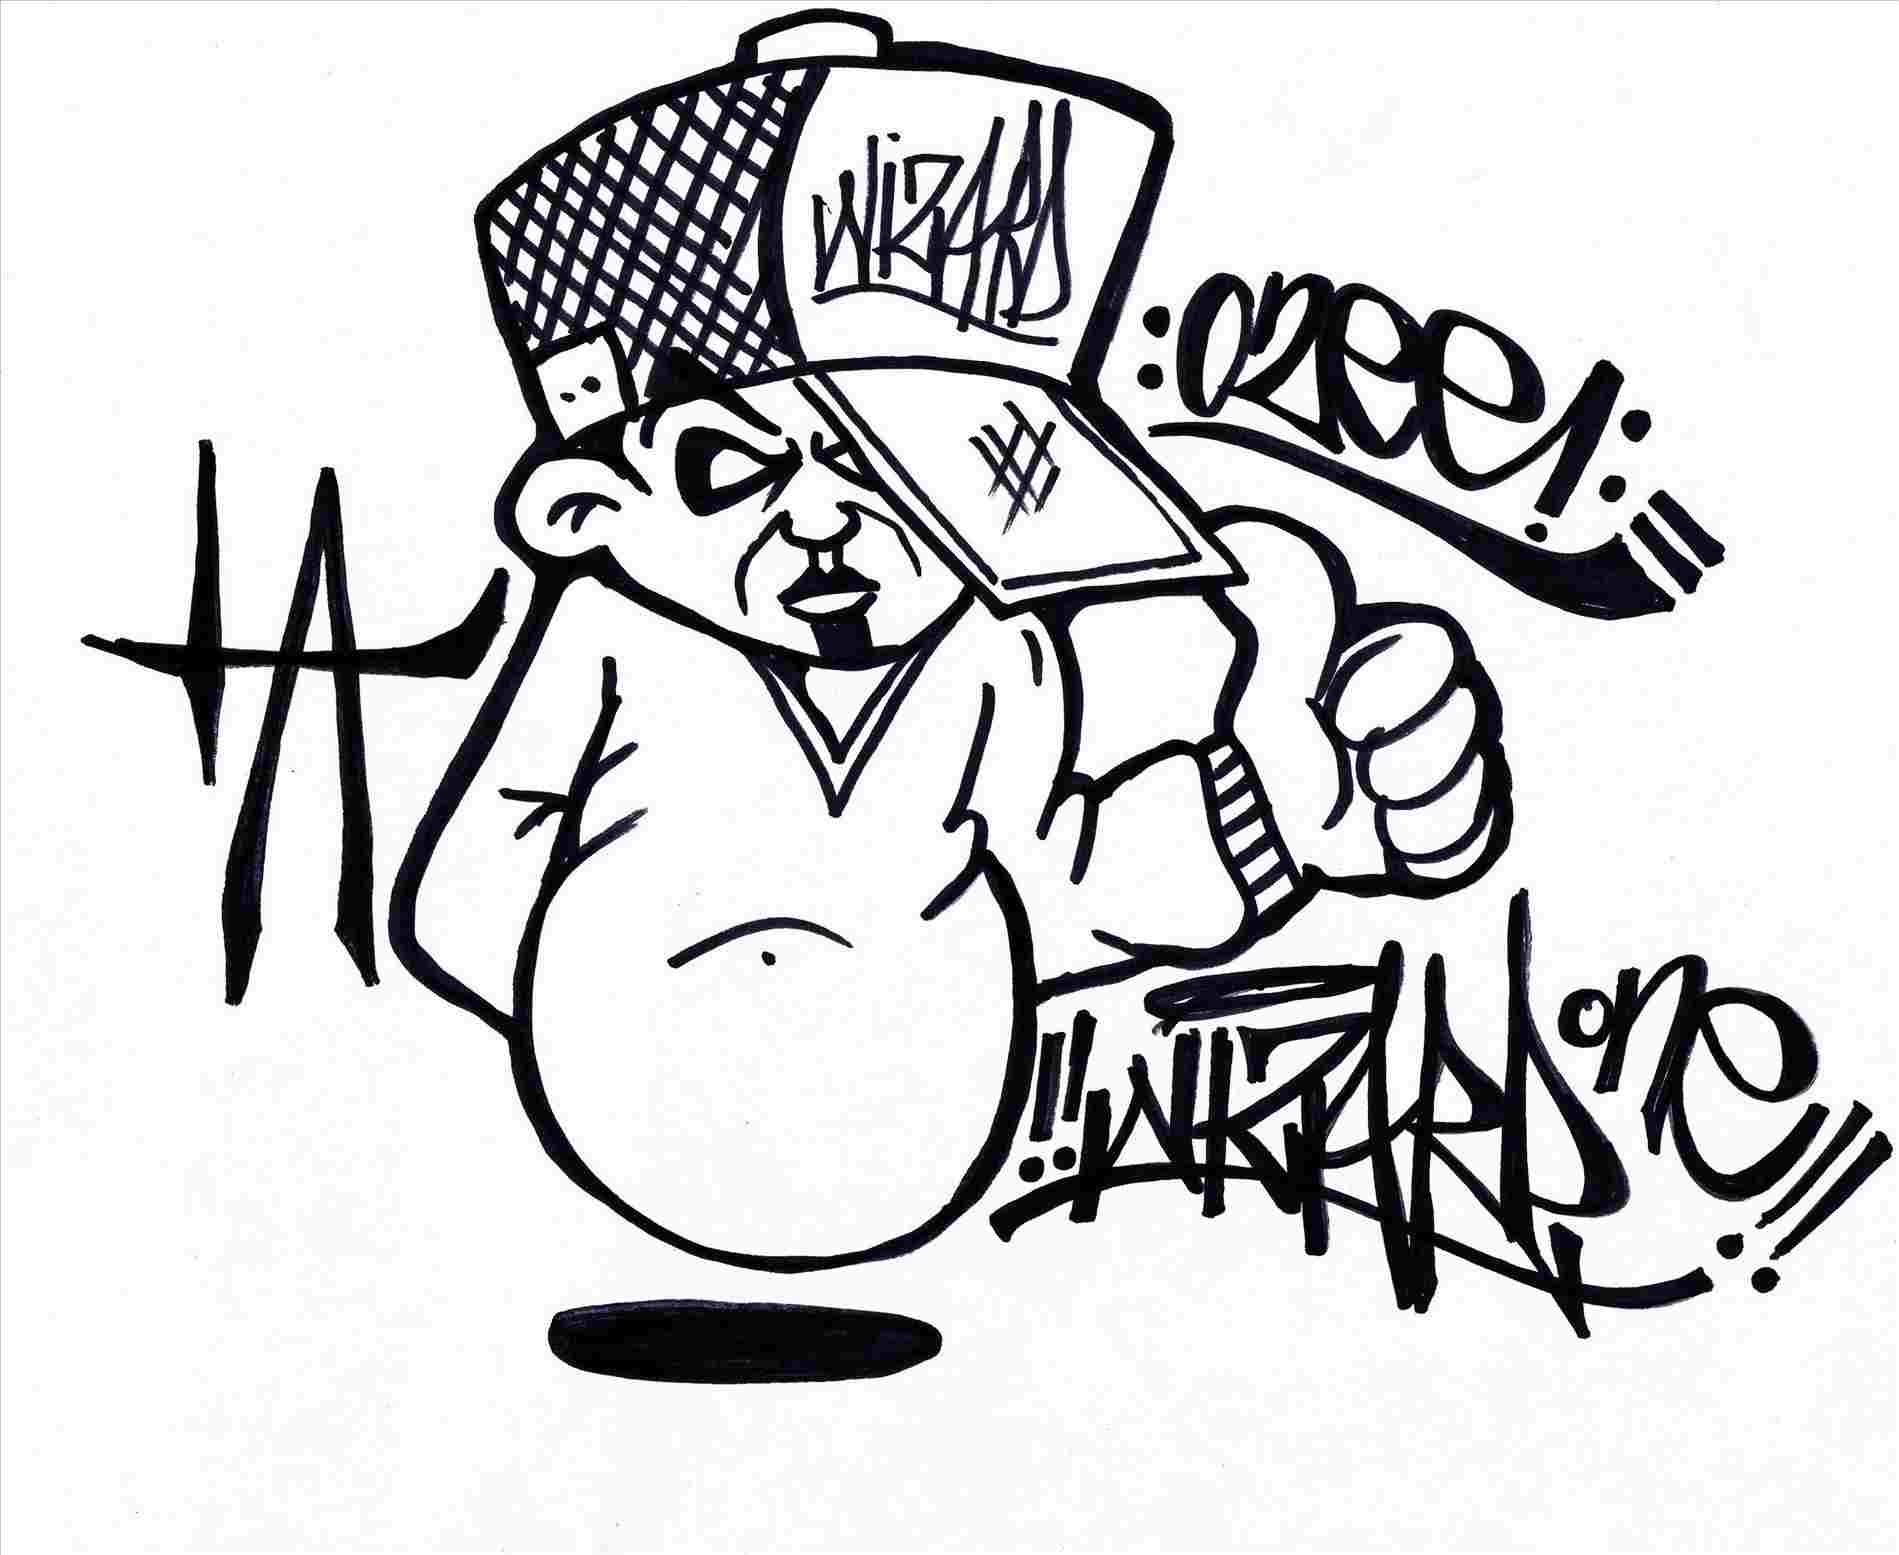 1899x1555 new cool wizard rhhmcfme graffiti graffiti easy wizard drawings